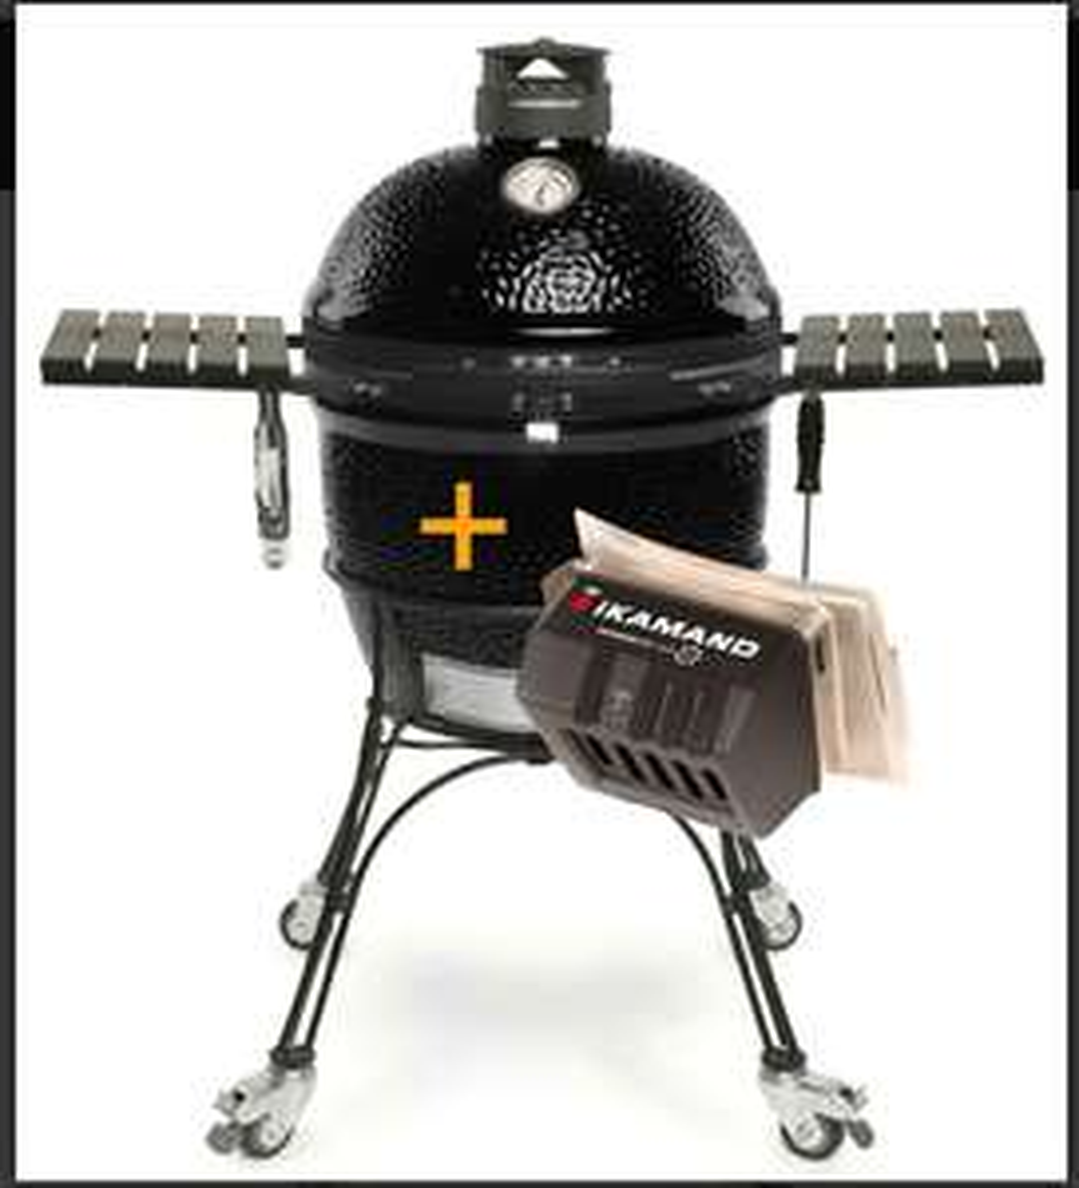 Kamado Joe Classic II Keramikgrill Black - limited Edition & IKamand Temperatursteuerungsgerät